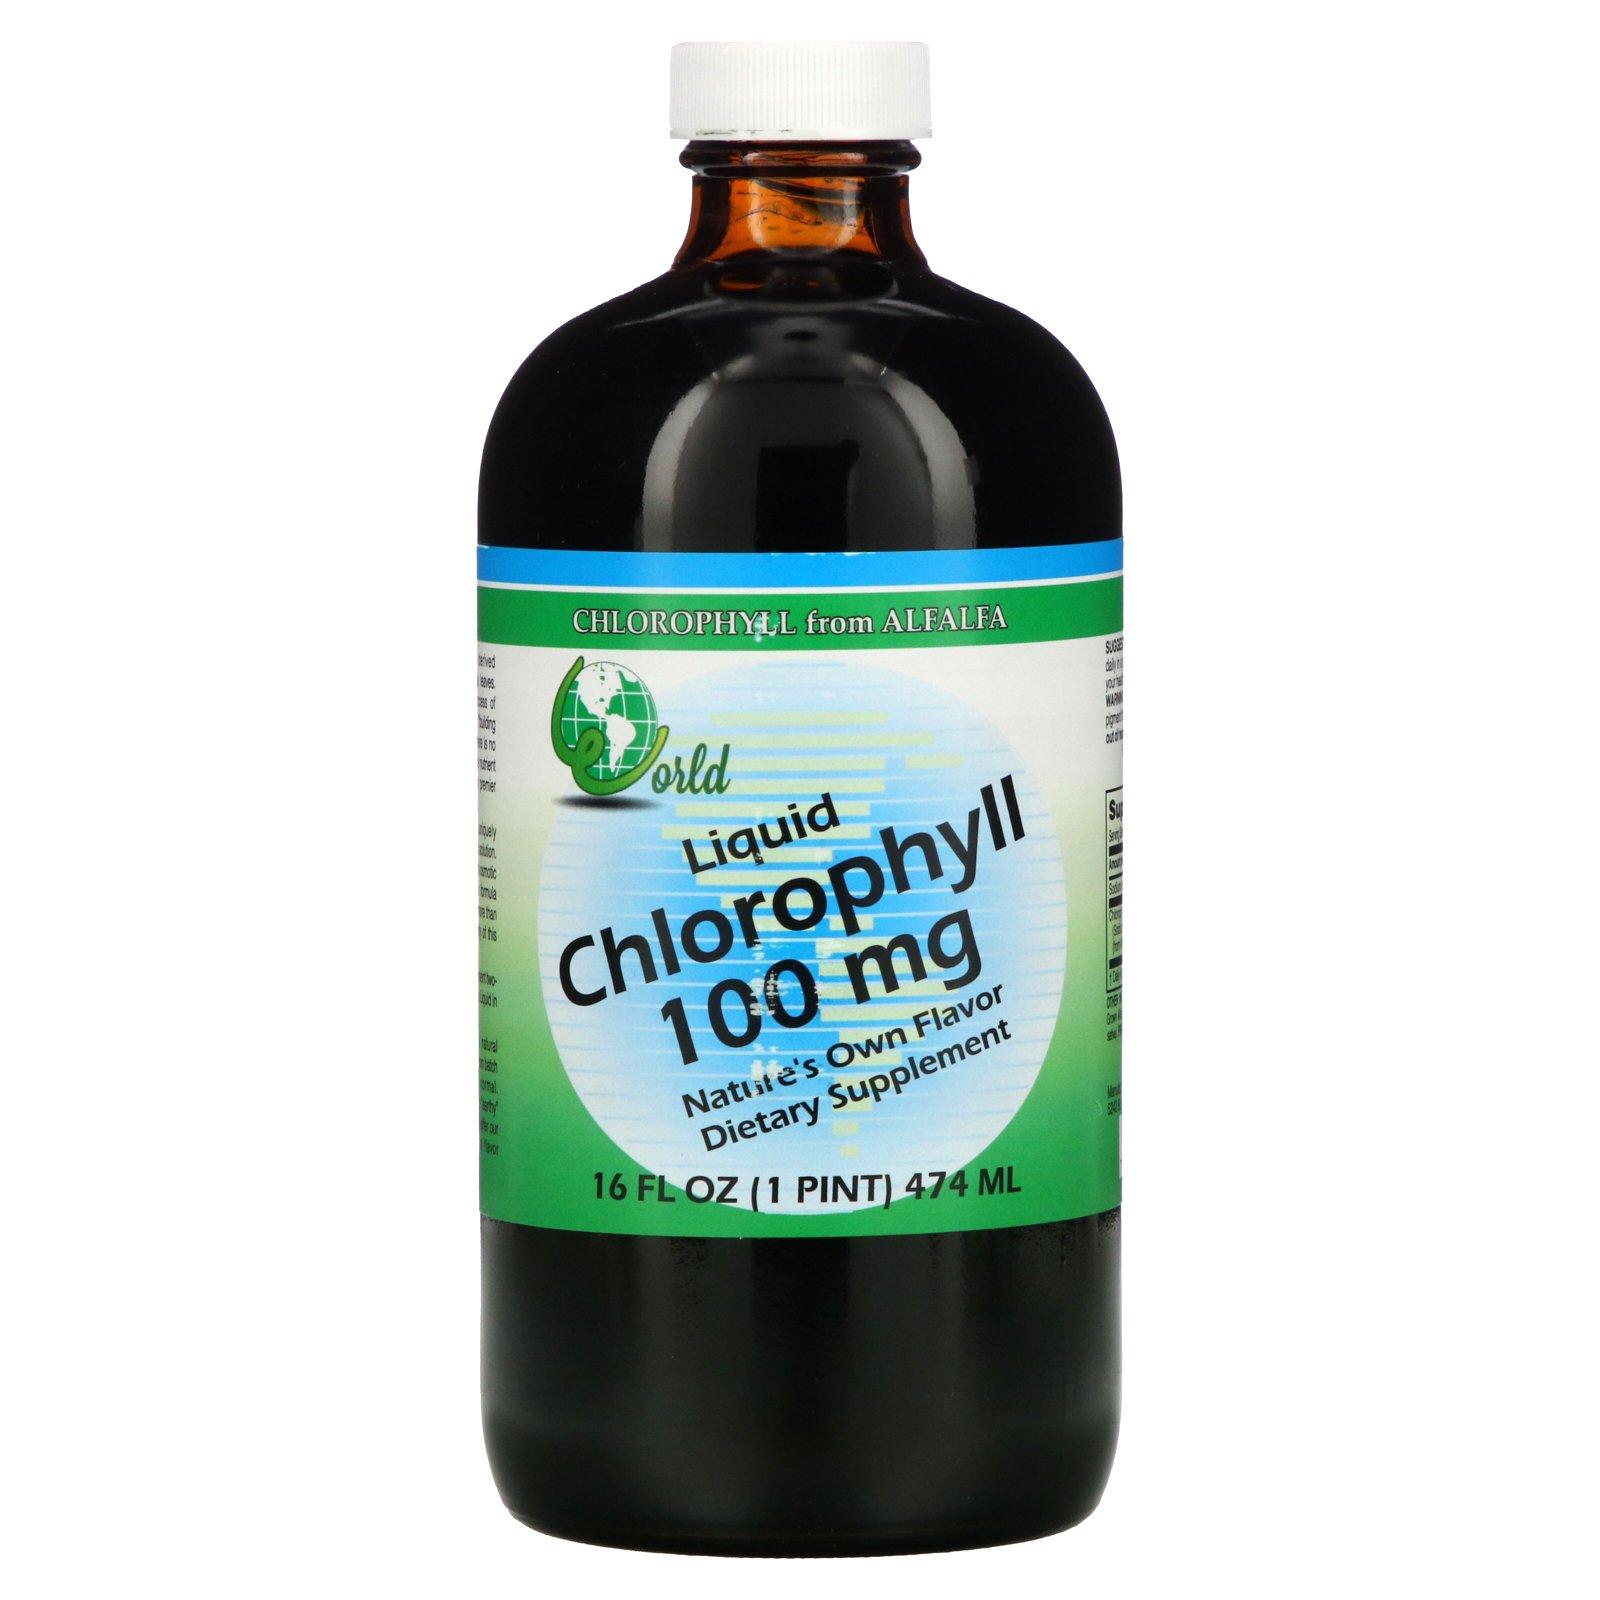 World Organic, жидкий хлорофилл, 100 мг, 474 мл (16 жидк. унций)